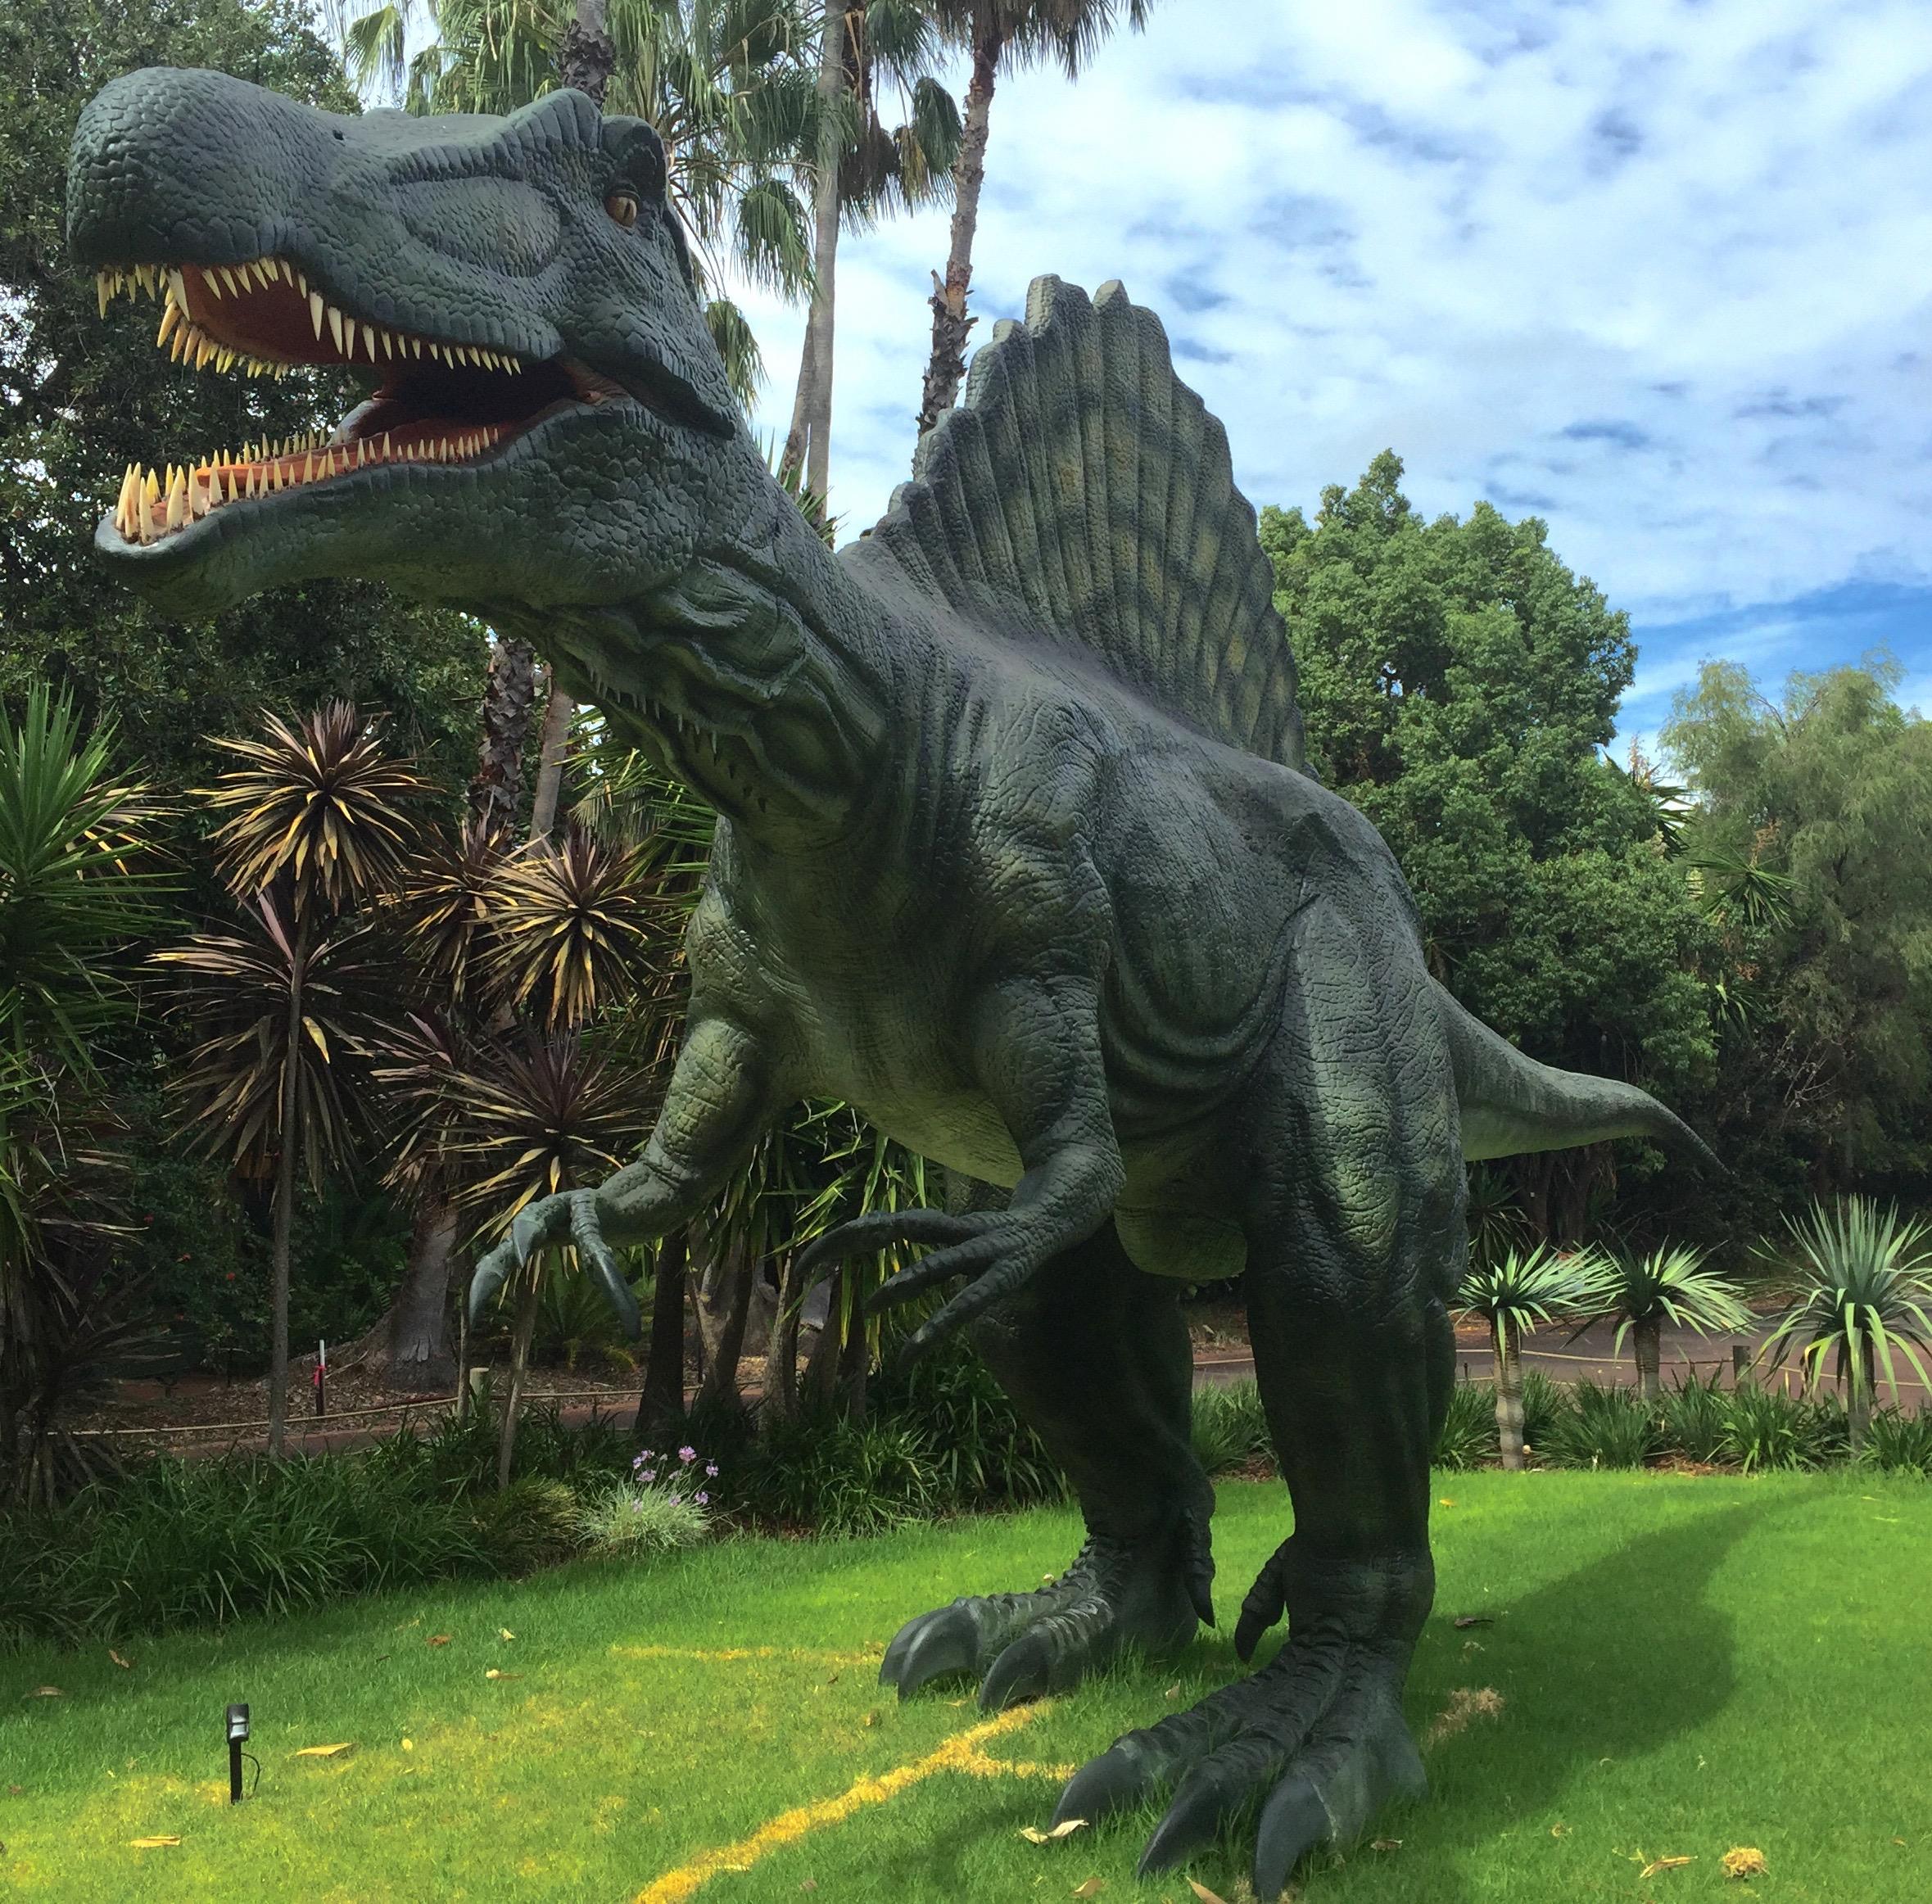 Spinosaurus - Perth Zoo